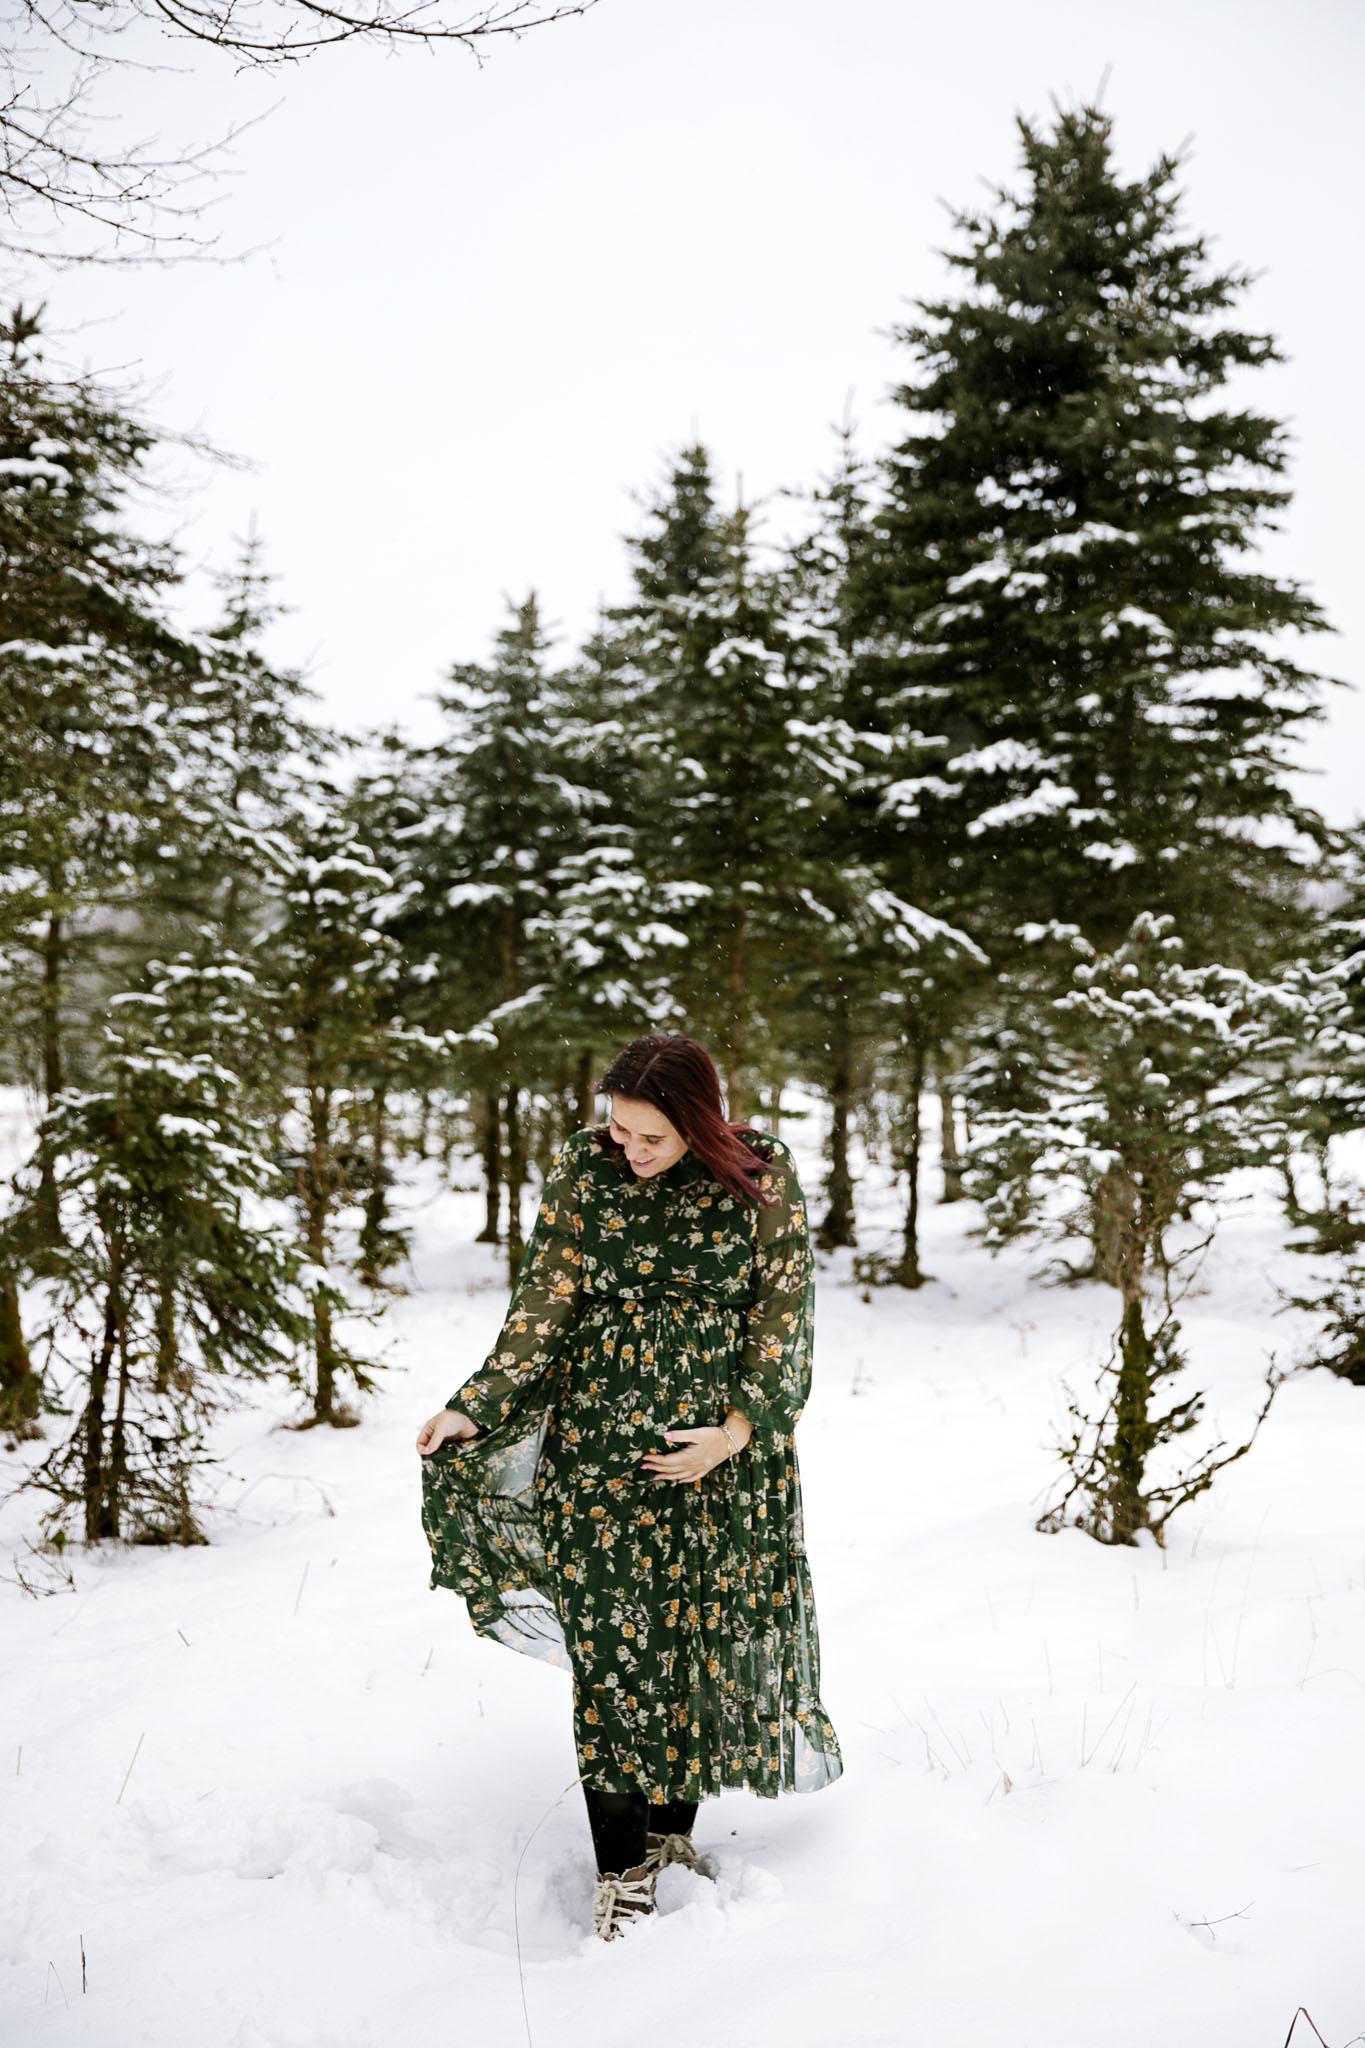 Gravidfotografering hos fotograf Emy i Halmstad och Laholm